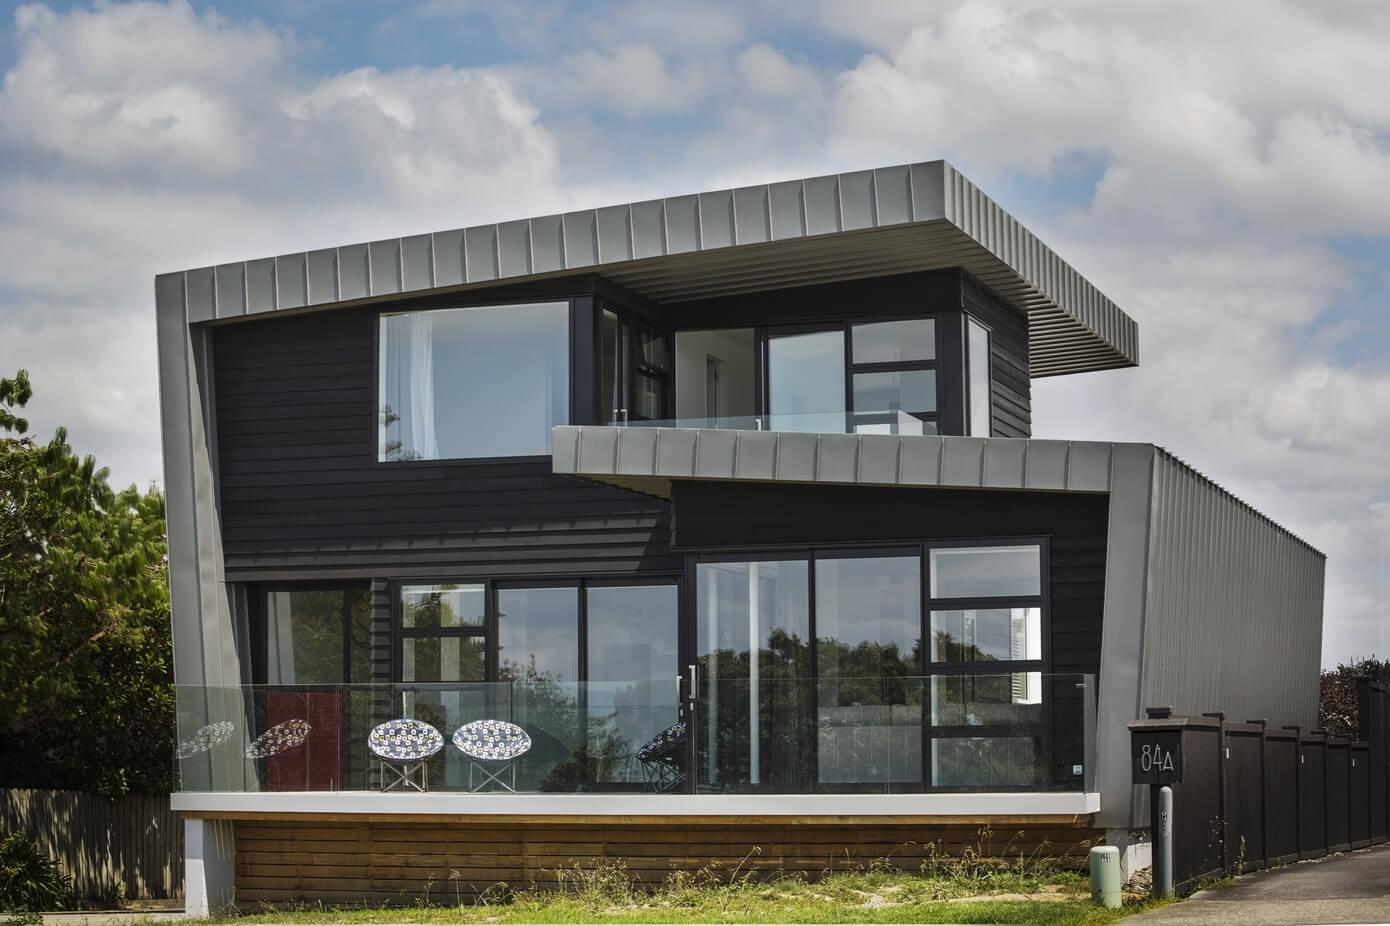 mclaren-house-archaus-architects-13